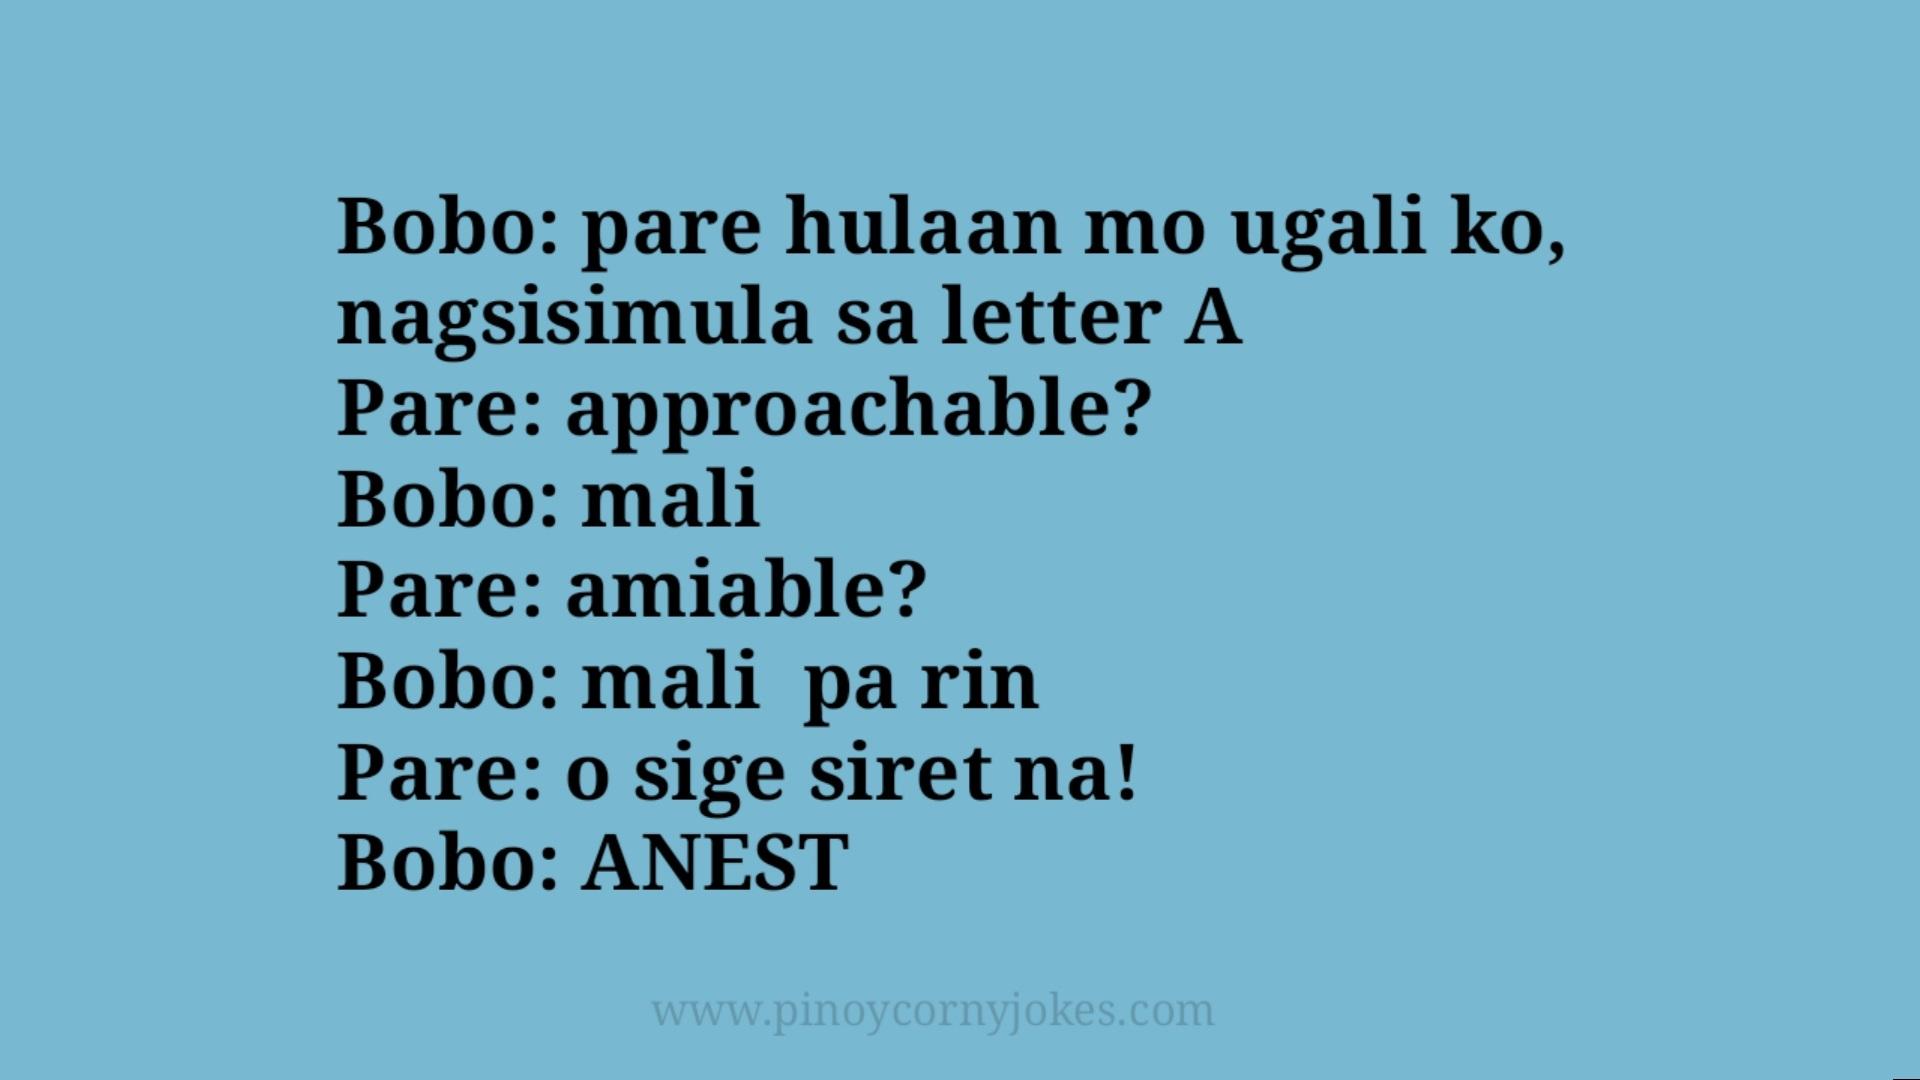 hulaan ugali tanga jokes pinoy